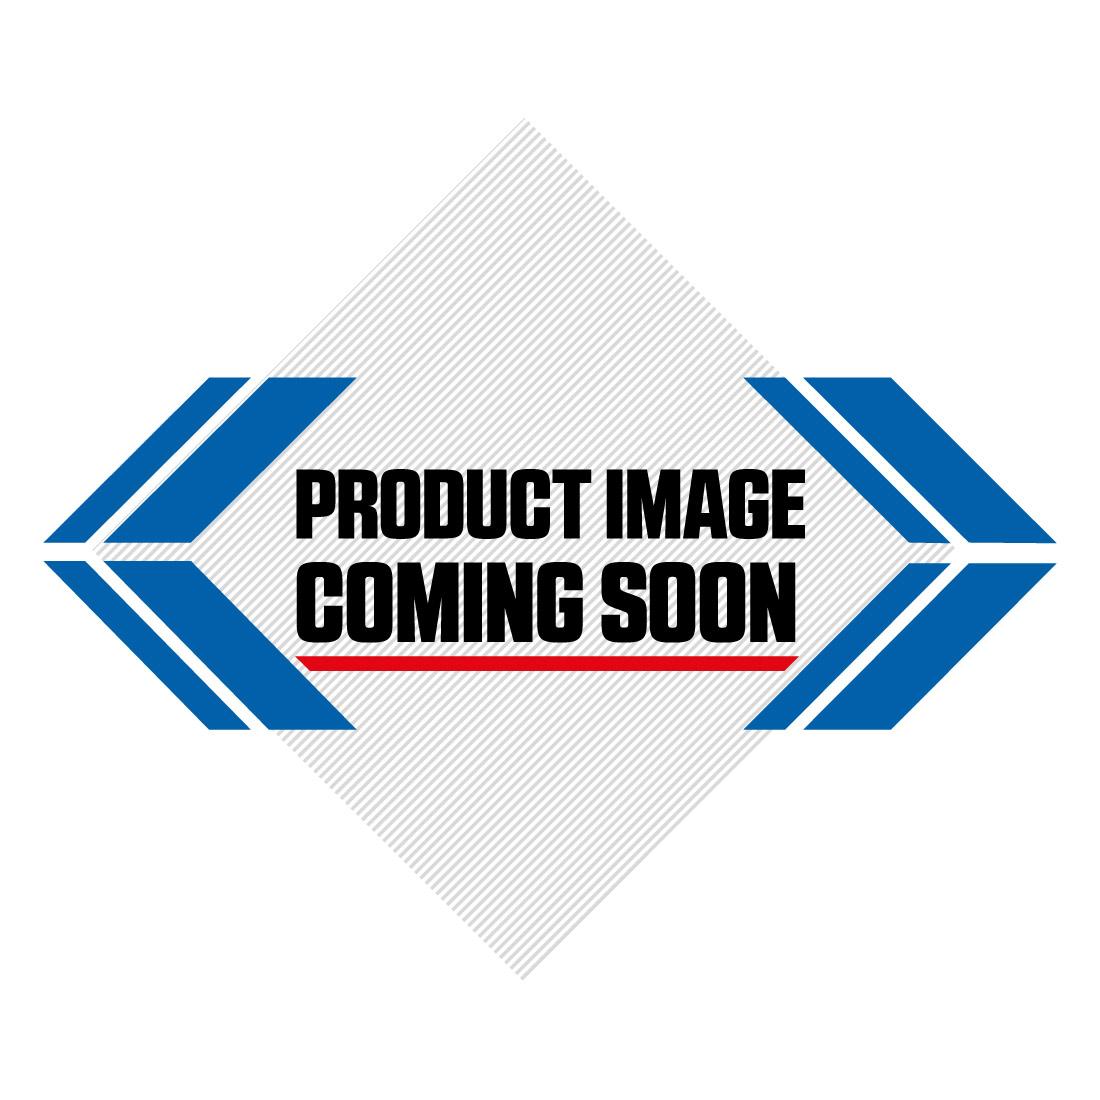 Renthal Twinring Rear Sprocket Kawasaki KX KXF KDX KLX Suzuki RMZ - Green Image-1>